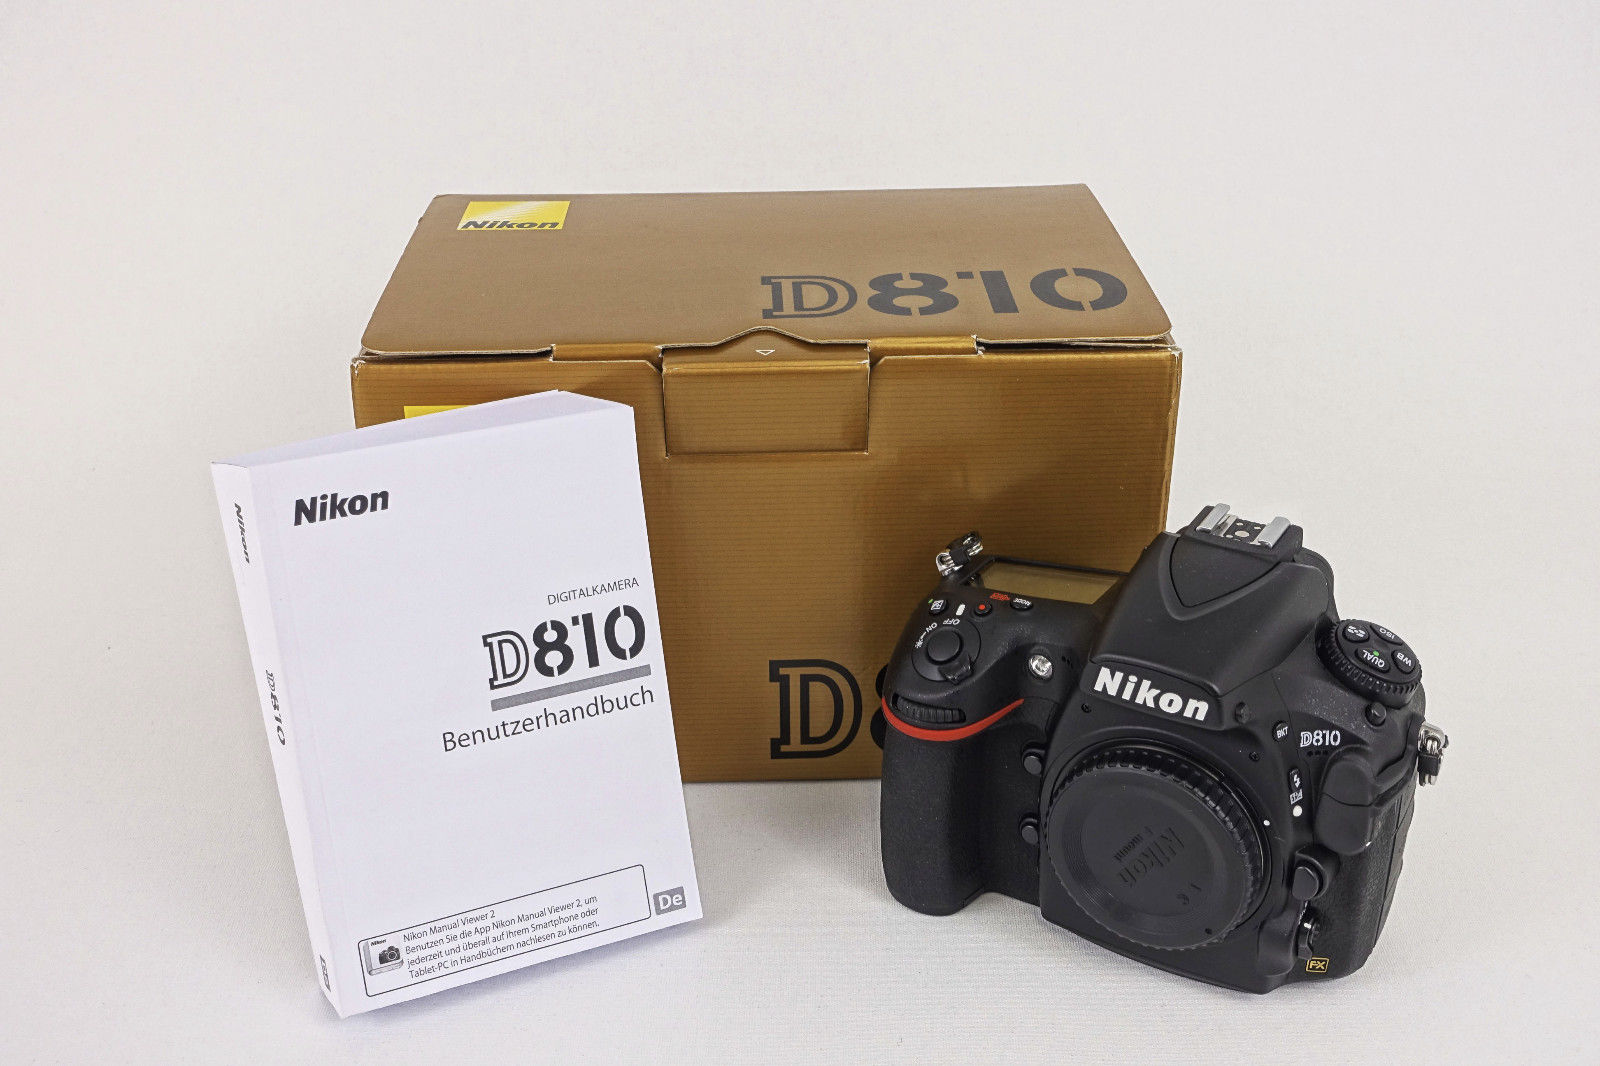 Nikon D810 OVP, TOP-Zustand, CF-Card